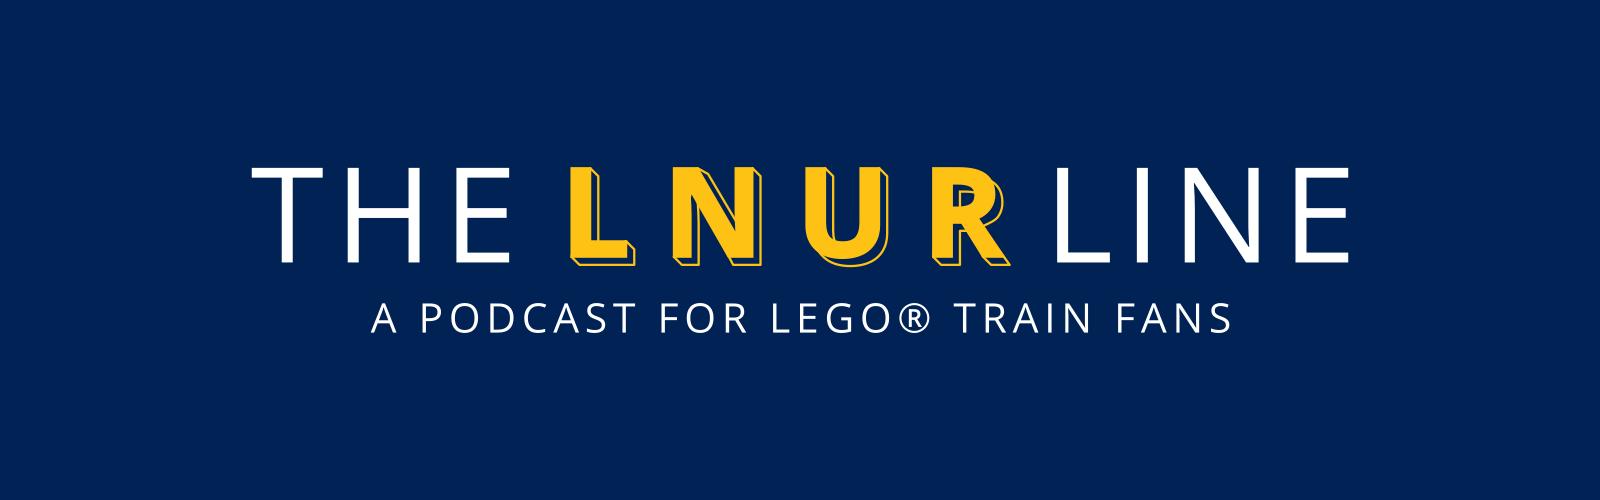 LNUR Line LEGO train fan podcast logo